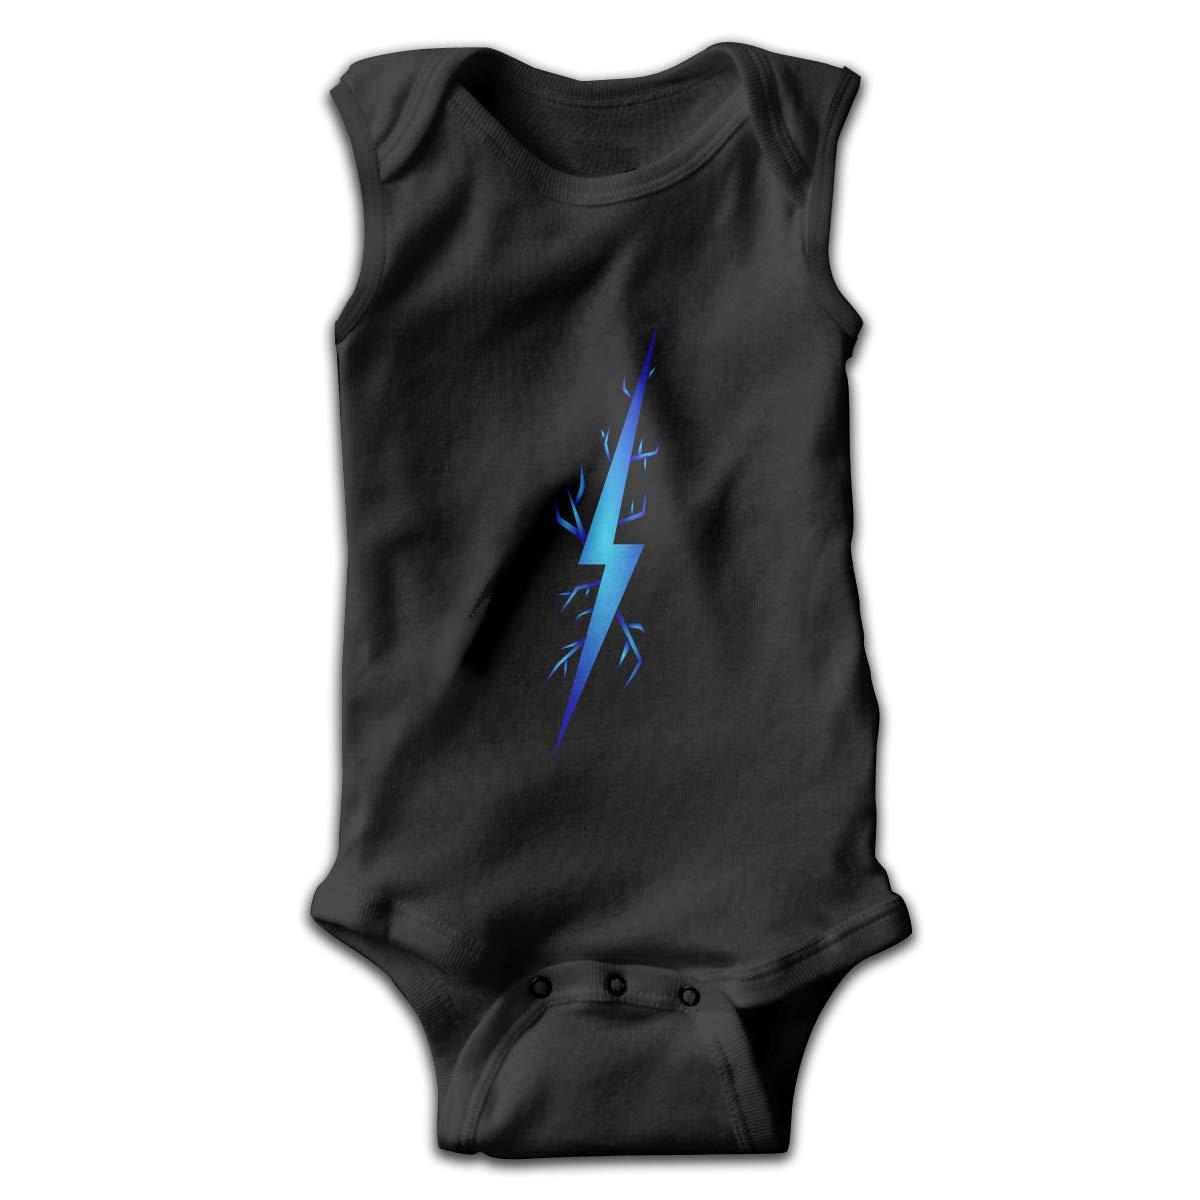 Dunpaiaa Blue Lightning Newborn Crawling Suit Sleeveless Romper Bodysuit Onesies Jumpsuit Black